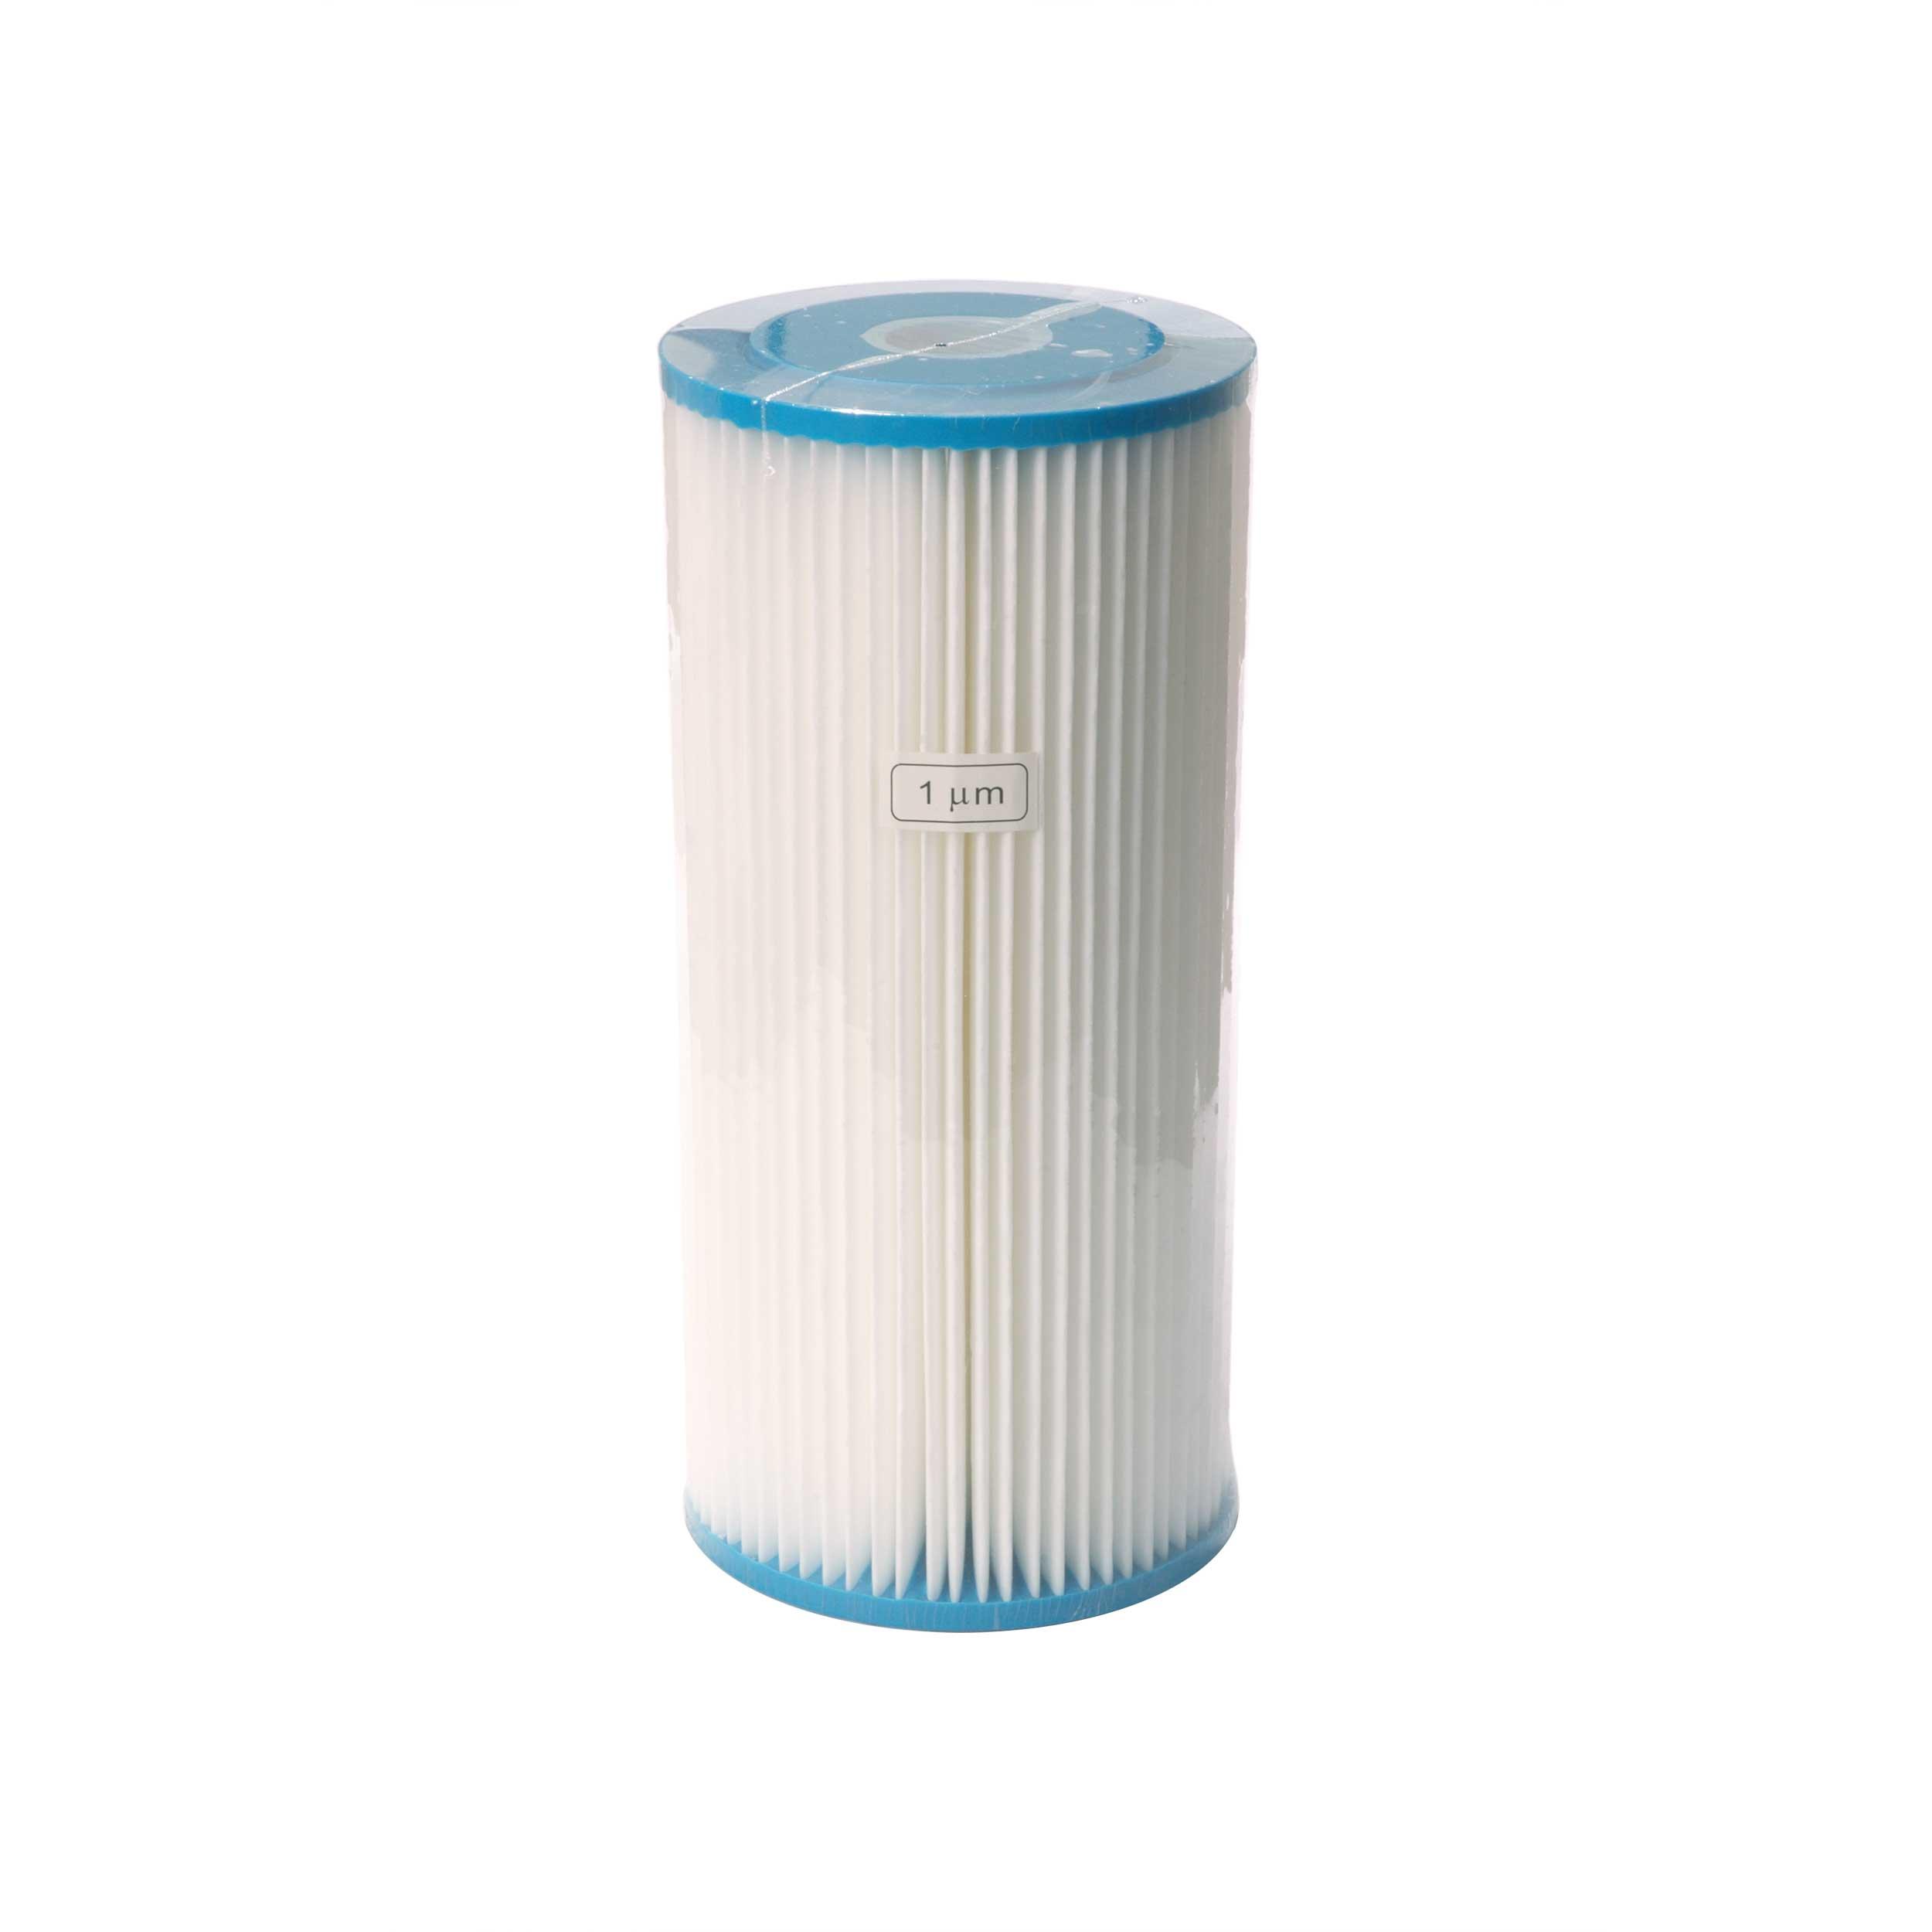 Pleated Sediment Filter 1 Micron